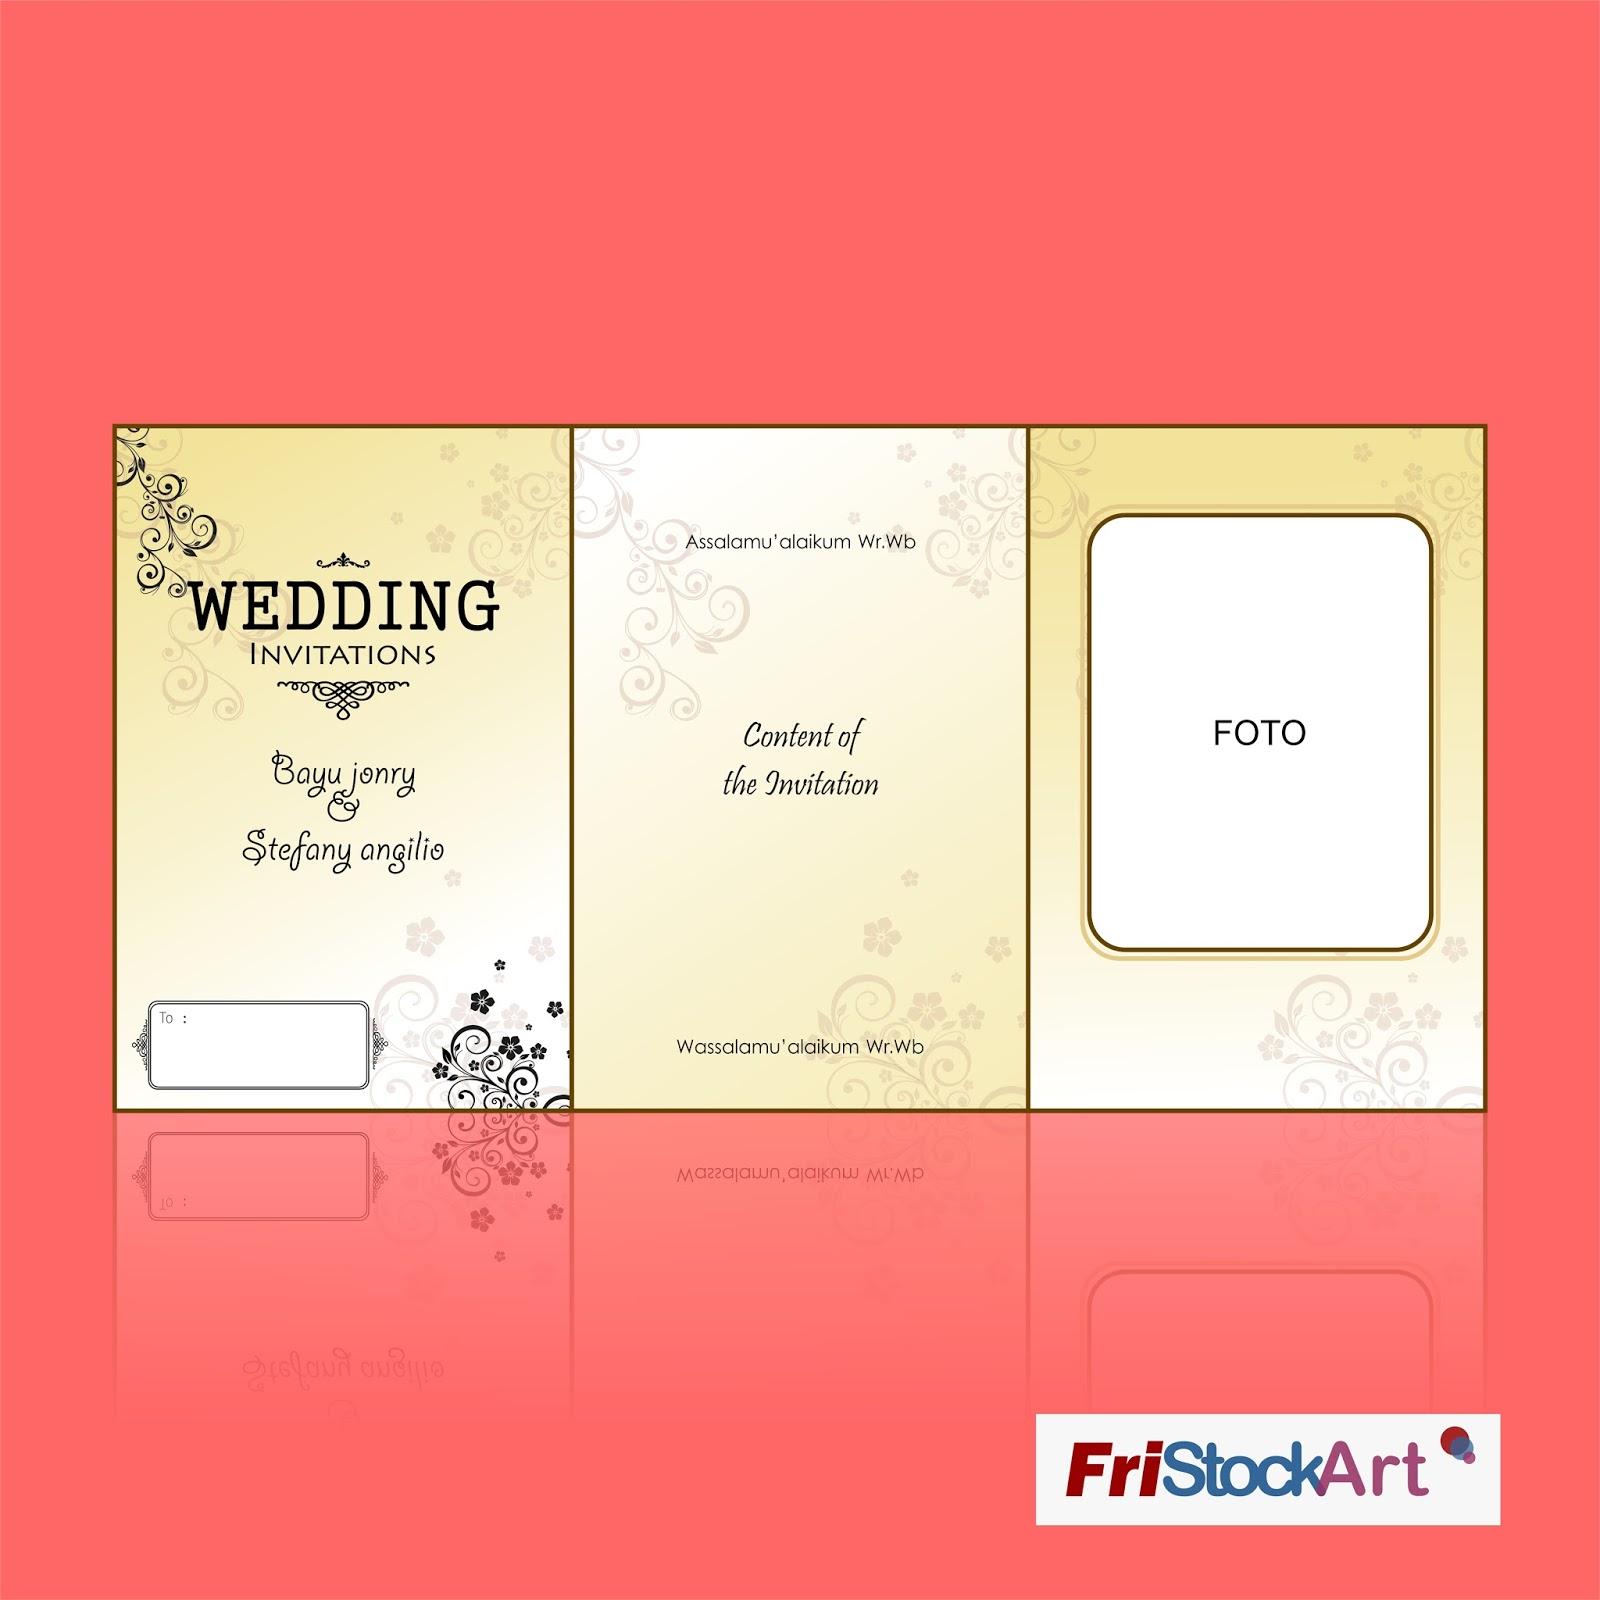 Fancy Wedding Invitations Yellow Ideas - Invitations and ...